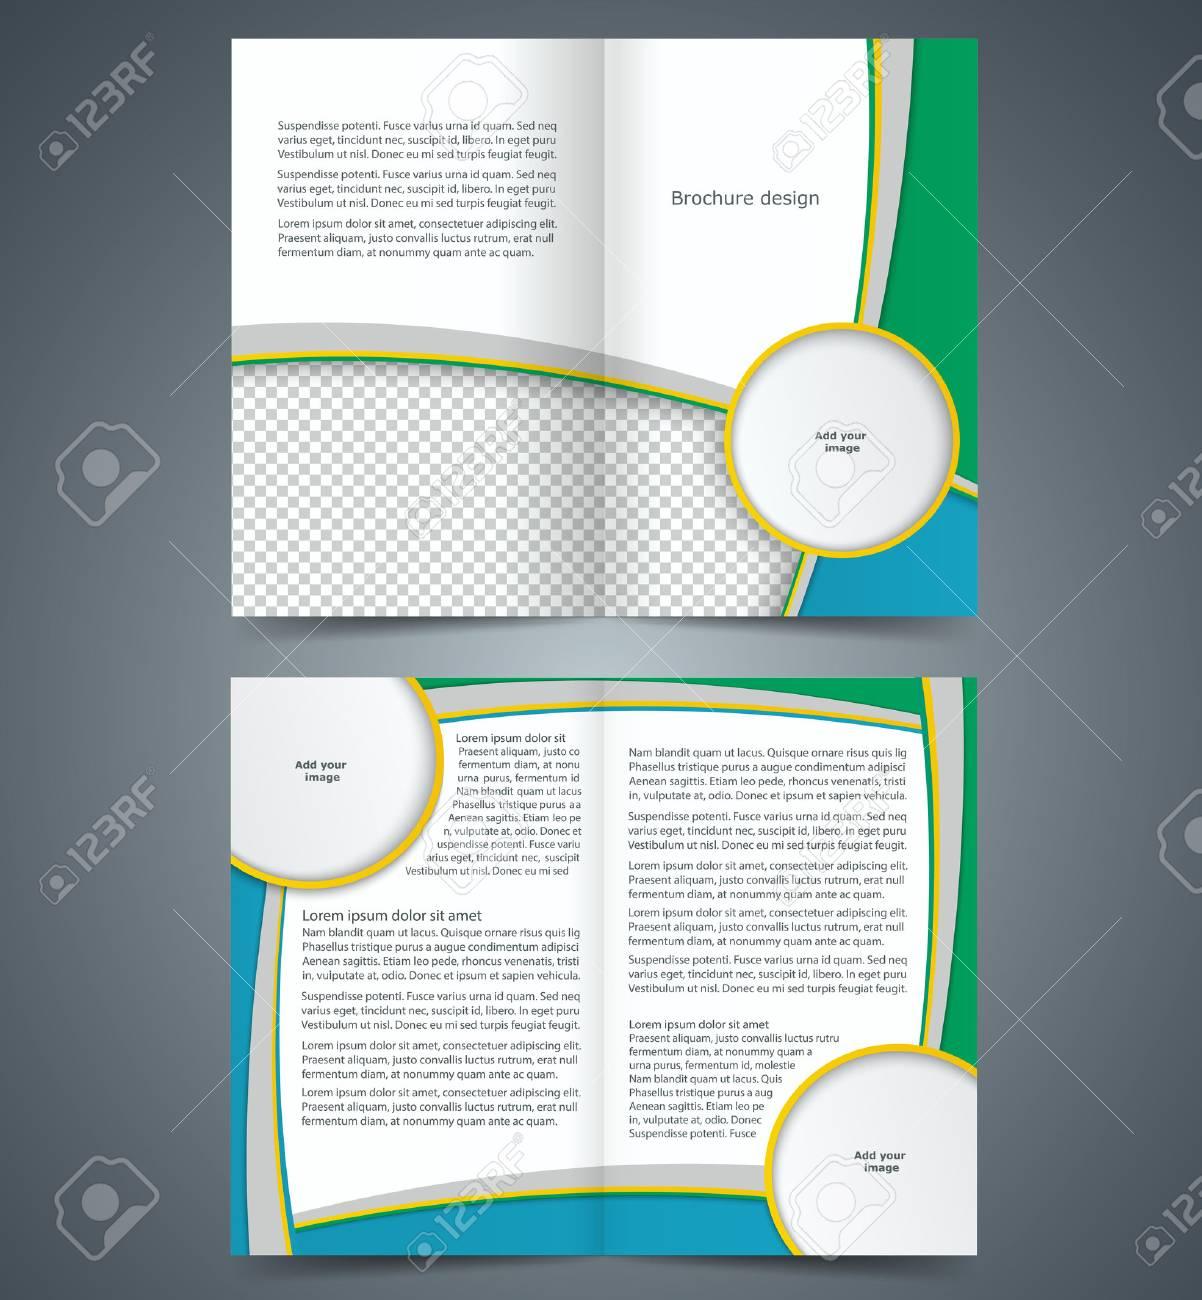 Sample Booklet Templates formal business report example lease – Sample Booklet Templates